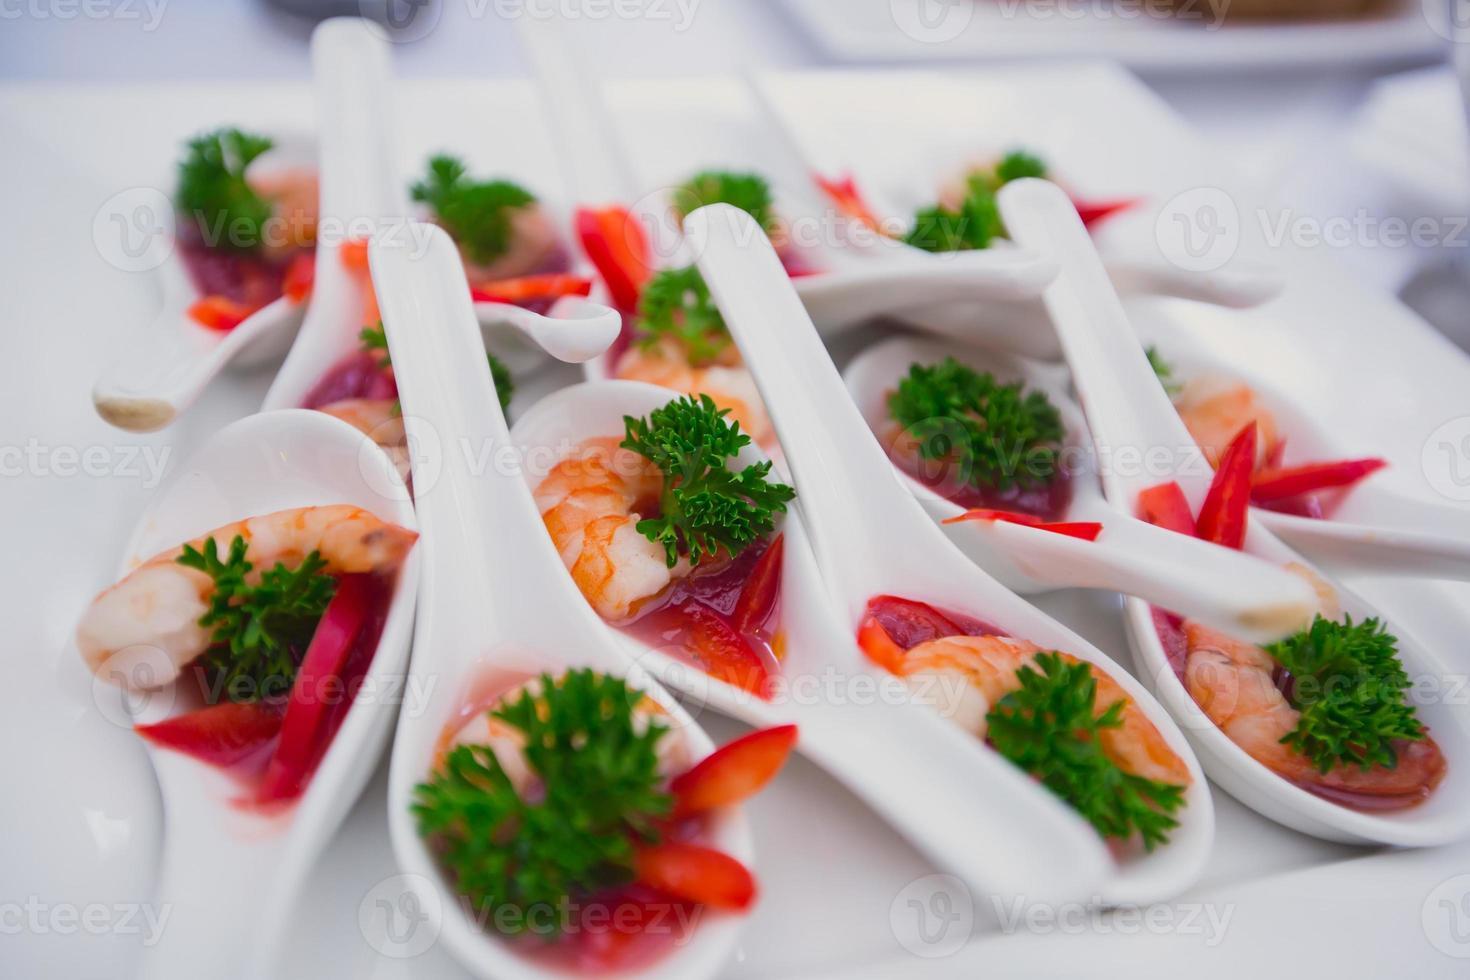 mesa de banquete lindamente decorada com petiscos variados foto